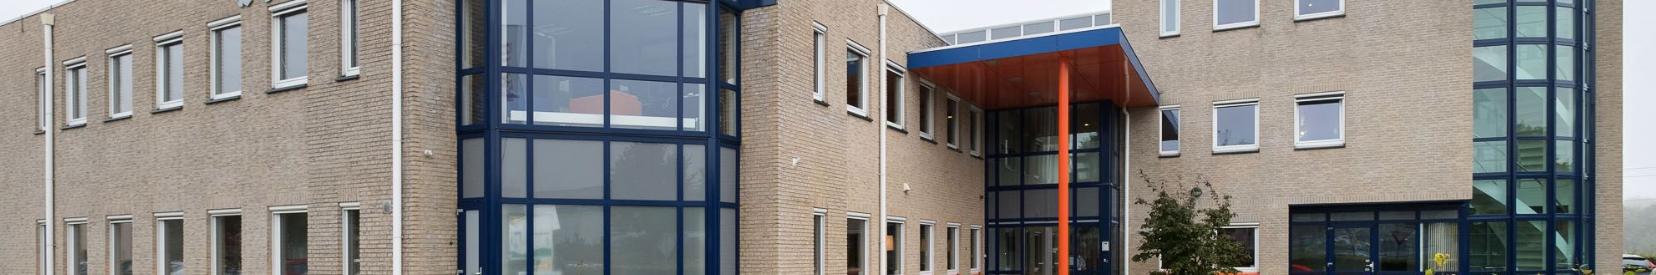 Outplacement en loopbaanadvies in Emmen